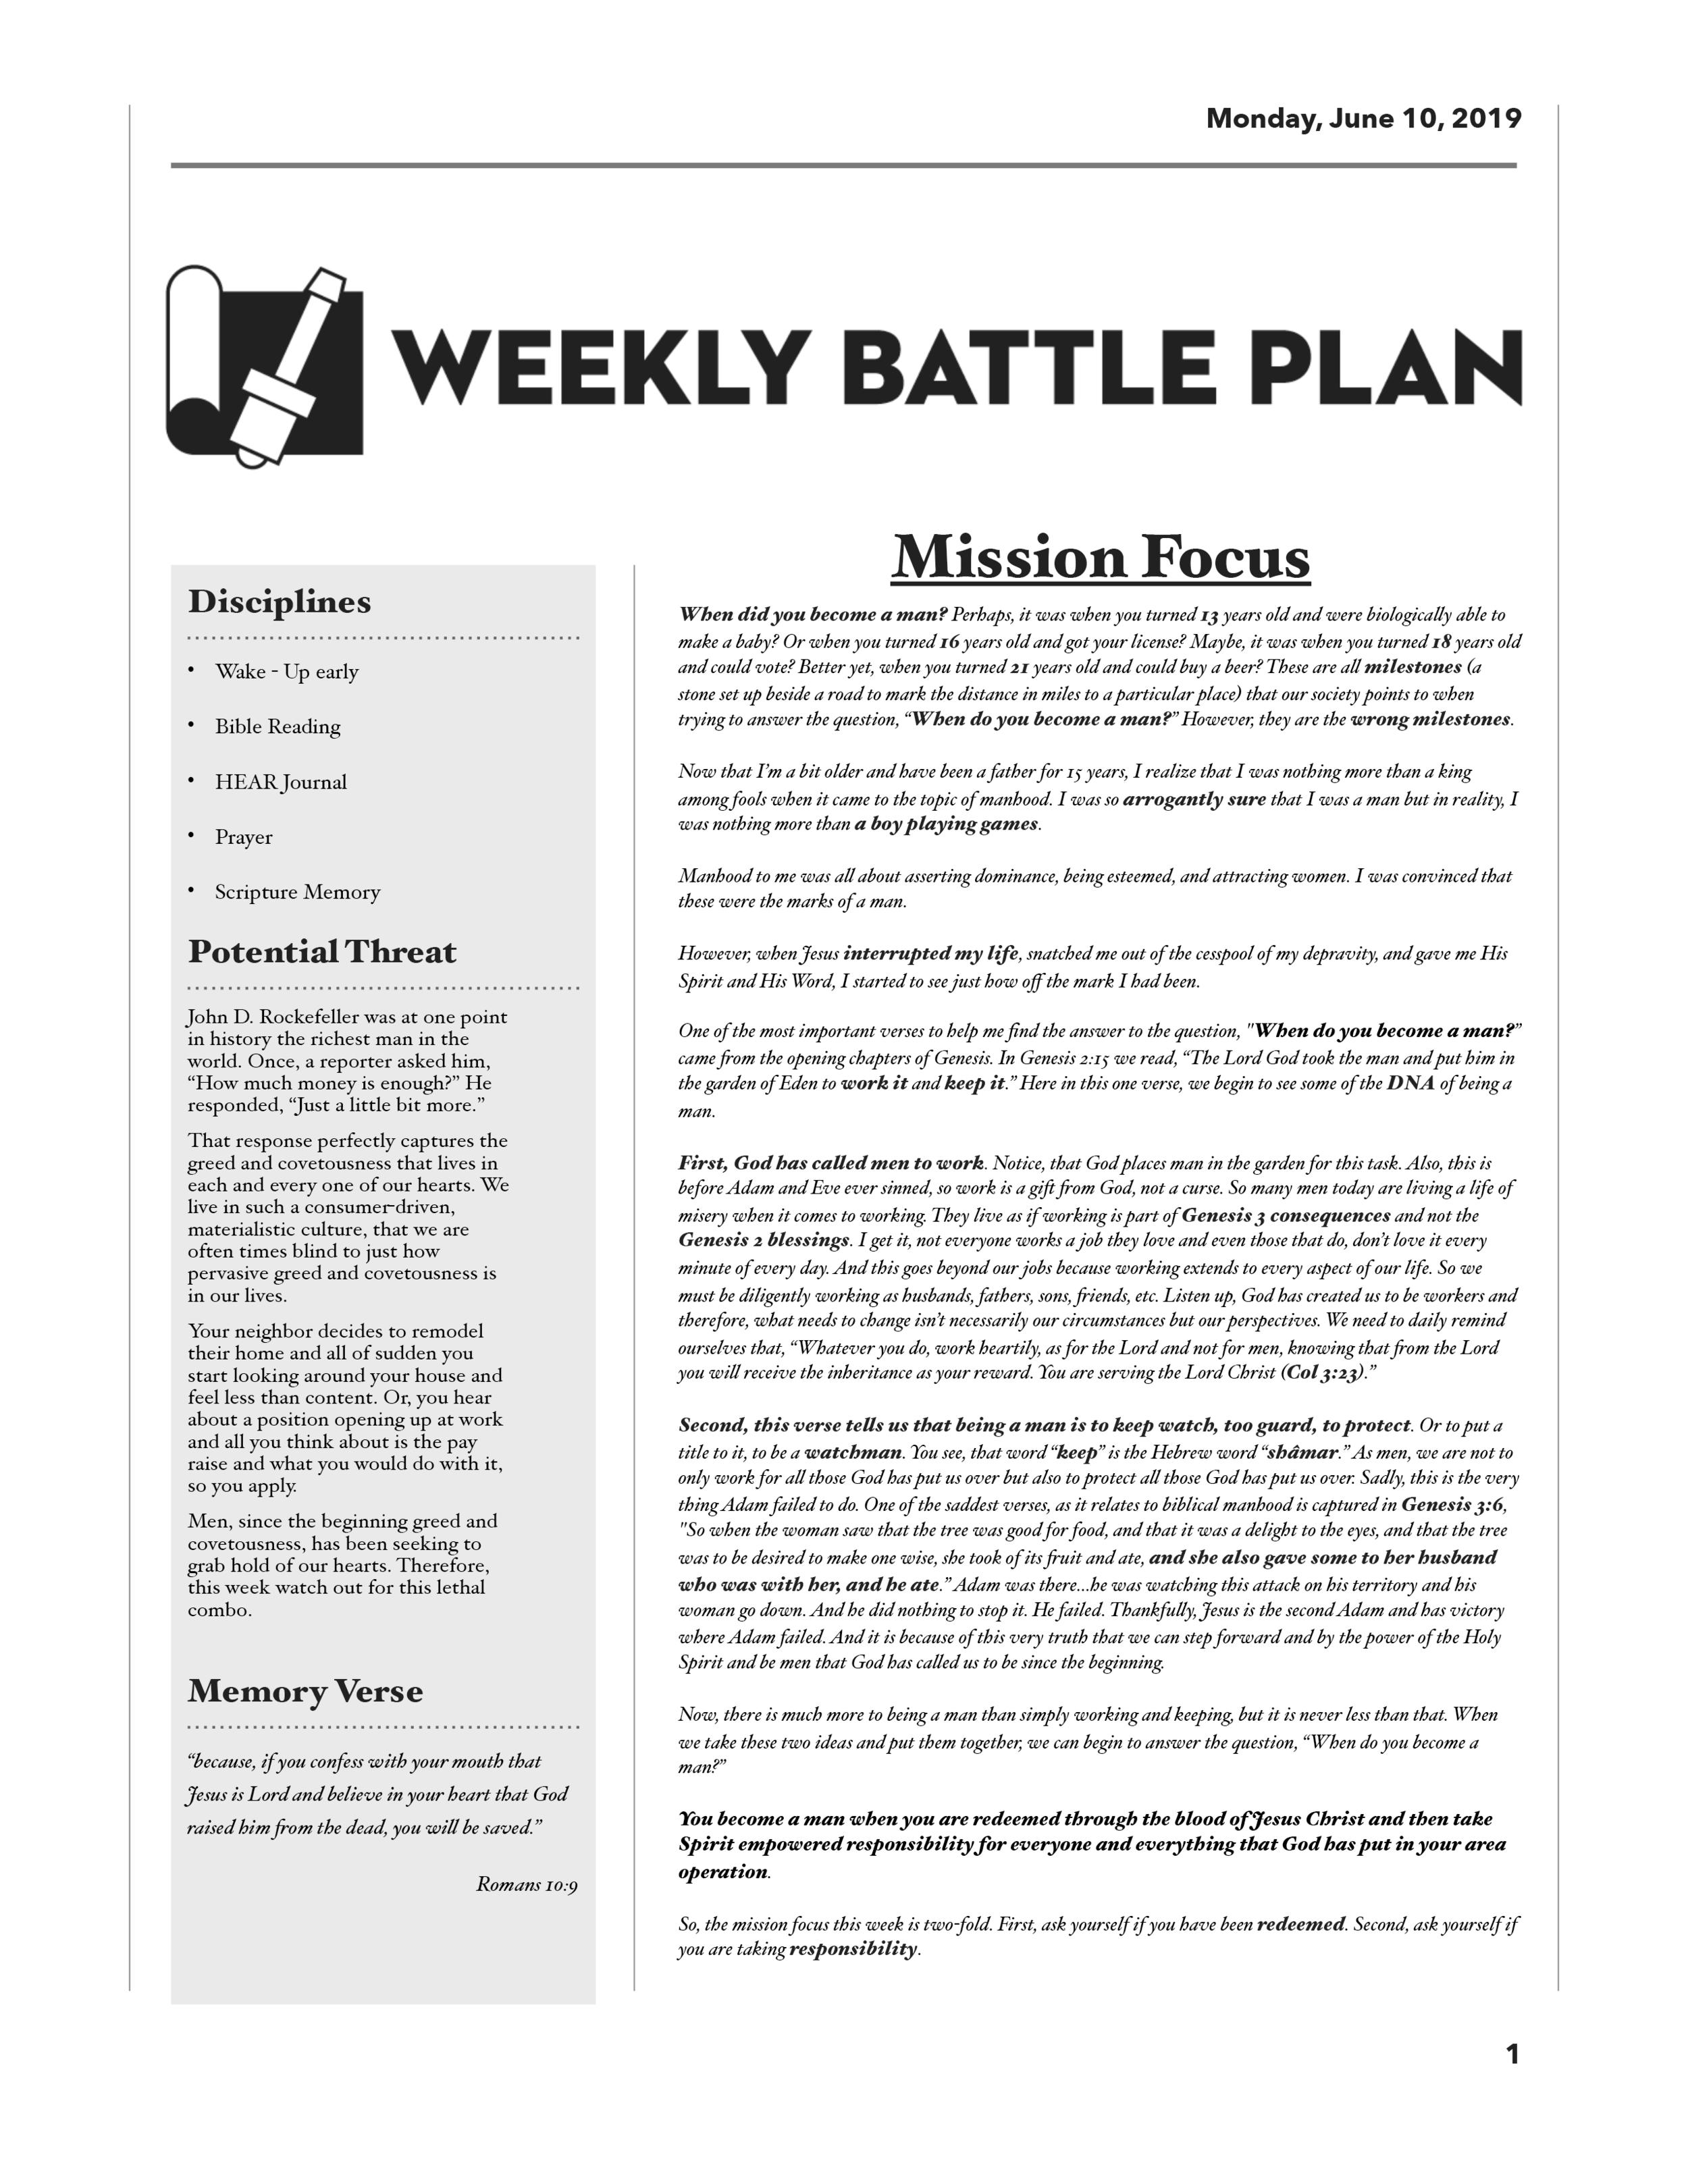 Battle Plan 6.10-1.png